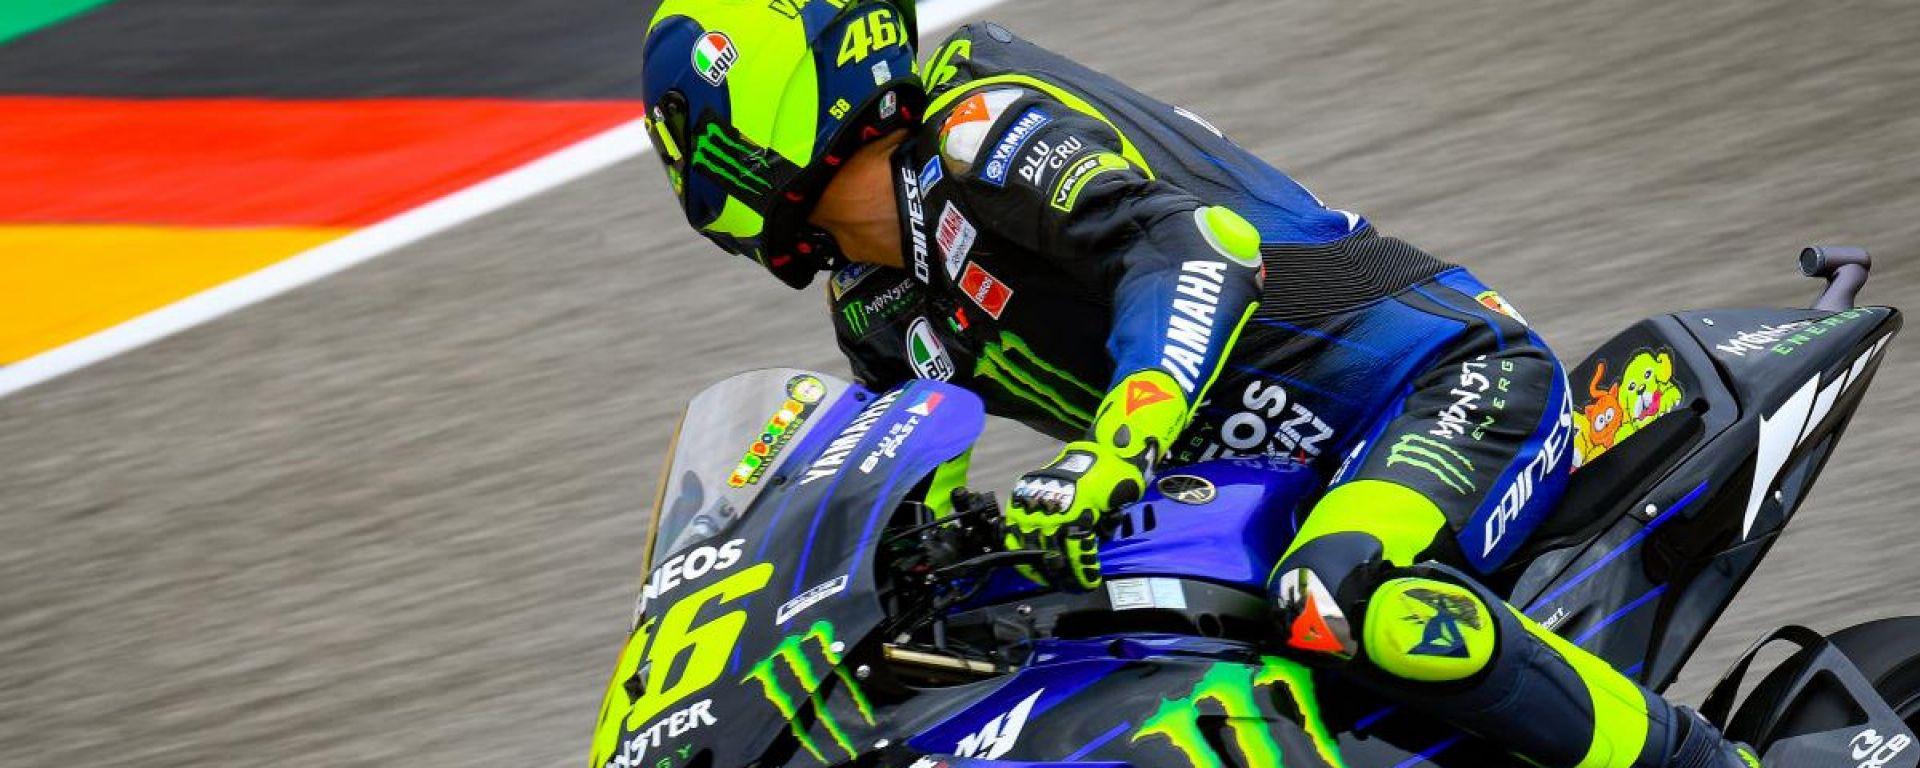 "MotoGP Germania, Rossi 11°: ""Sono lento nel T4"""